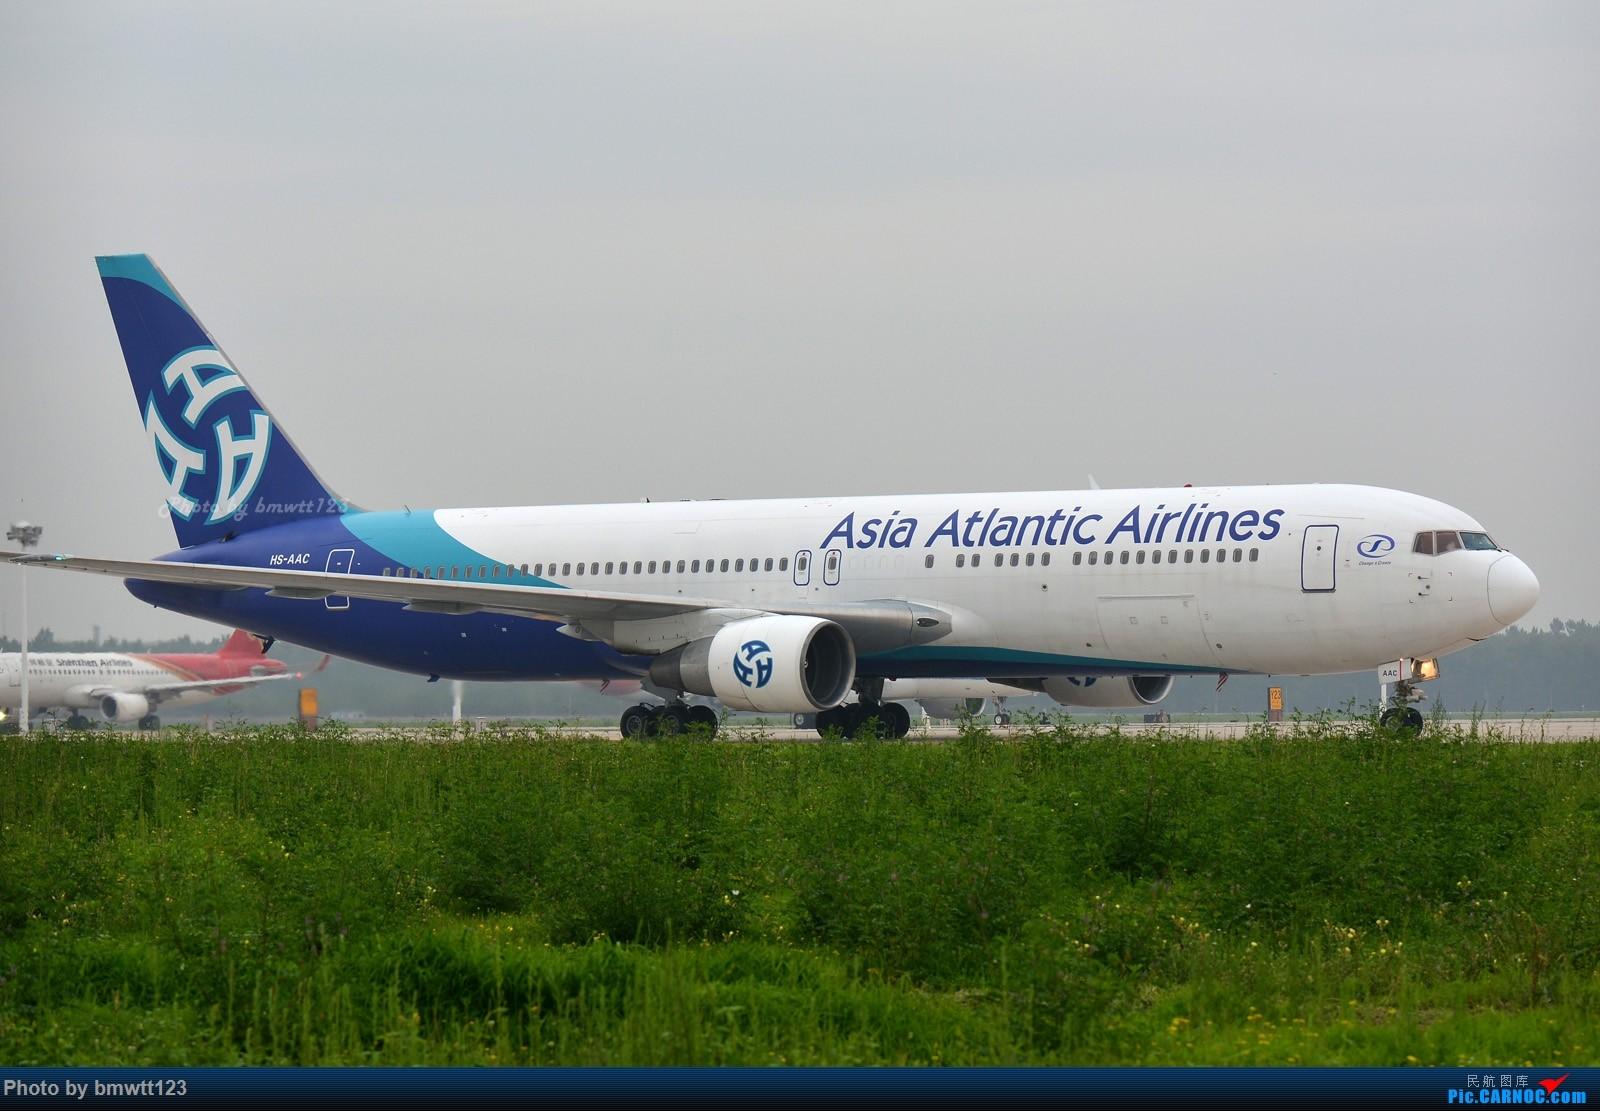 Re:[原创]【SHE沈阳】桃仙地面一组(45图)自带地景! 767-300 HS-AAC 中国沈阳桃仙国际机场